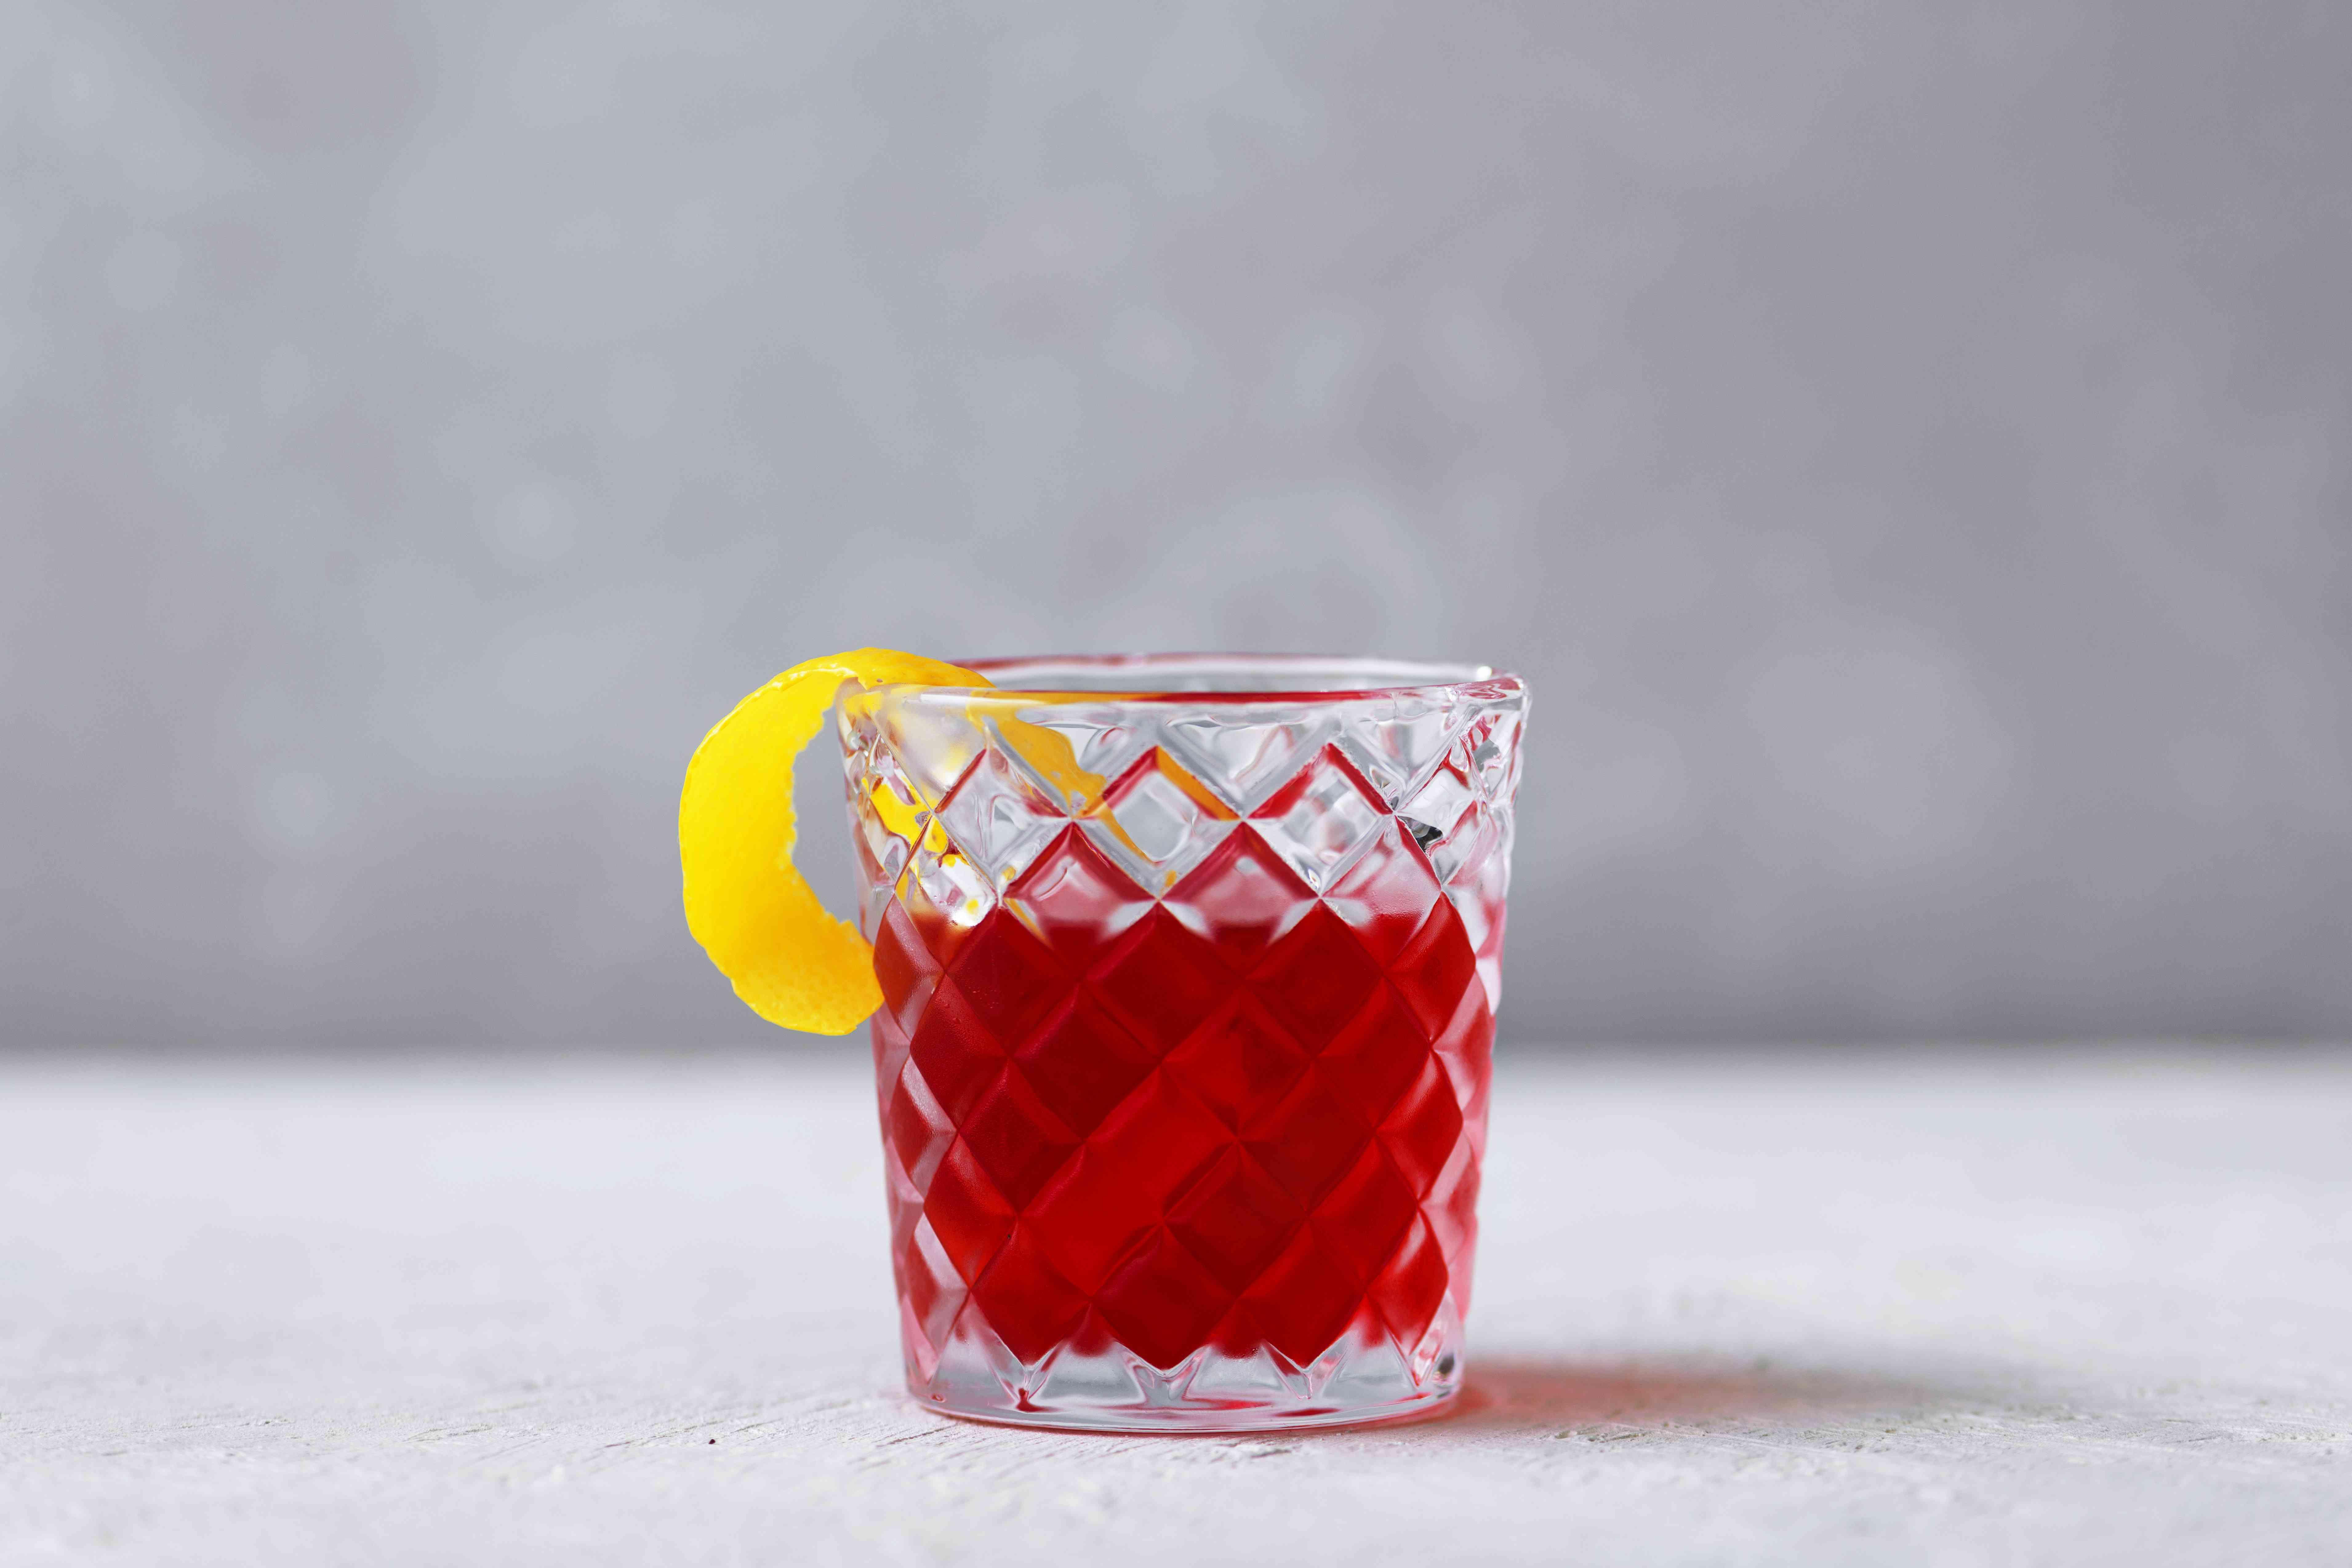 Campari Cocktail garnished with a lemon twist